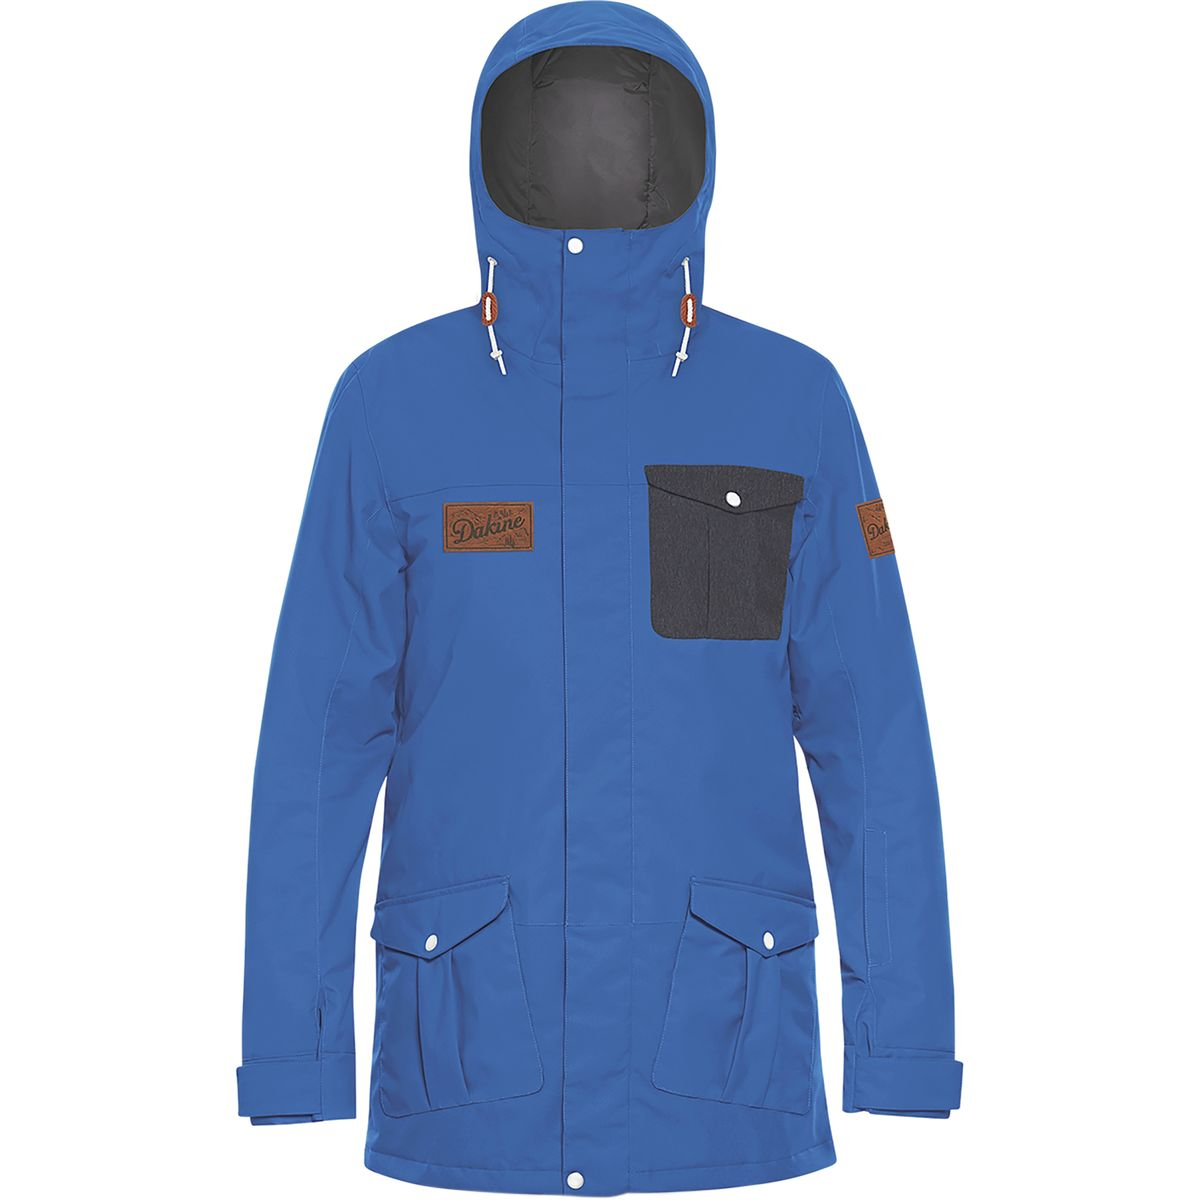 DAKINE Rampart 65 Insulated Jacket - Men